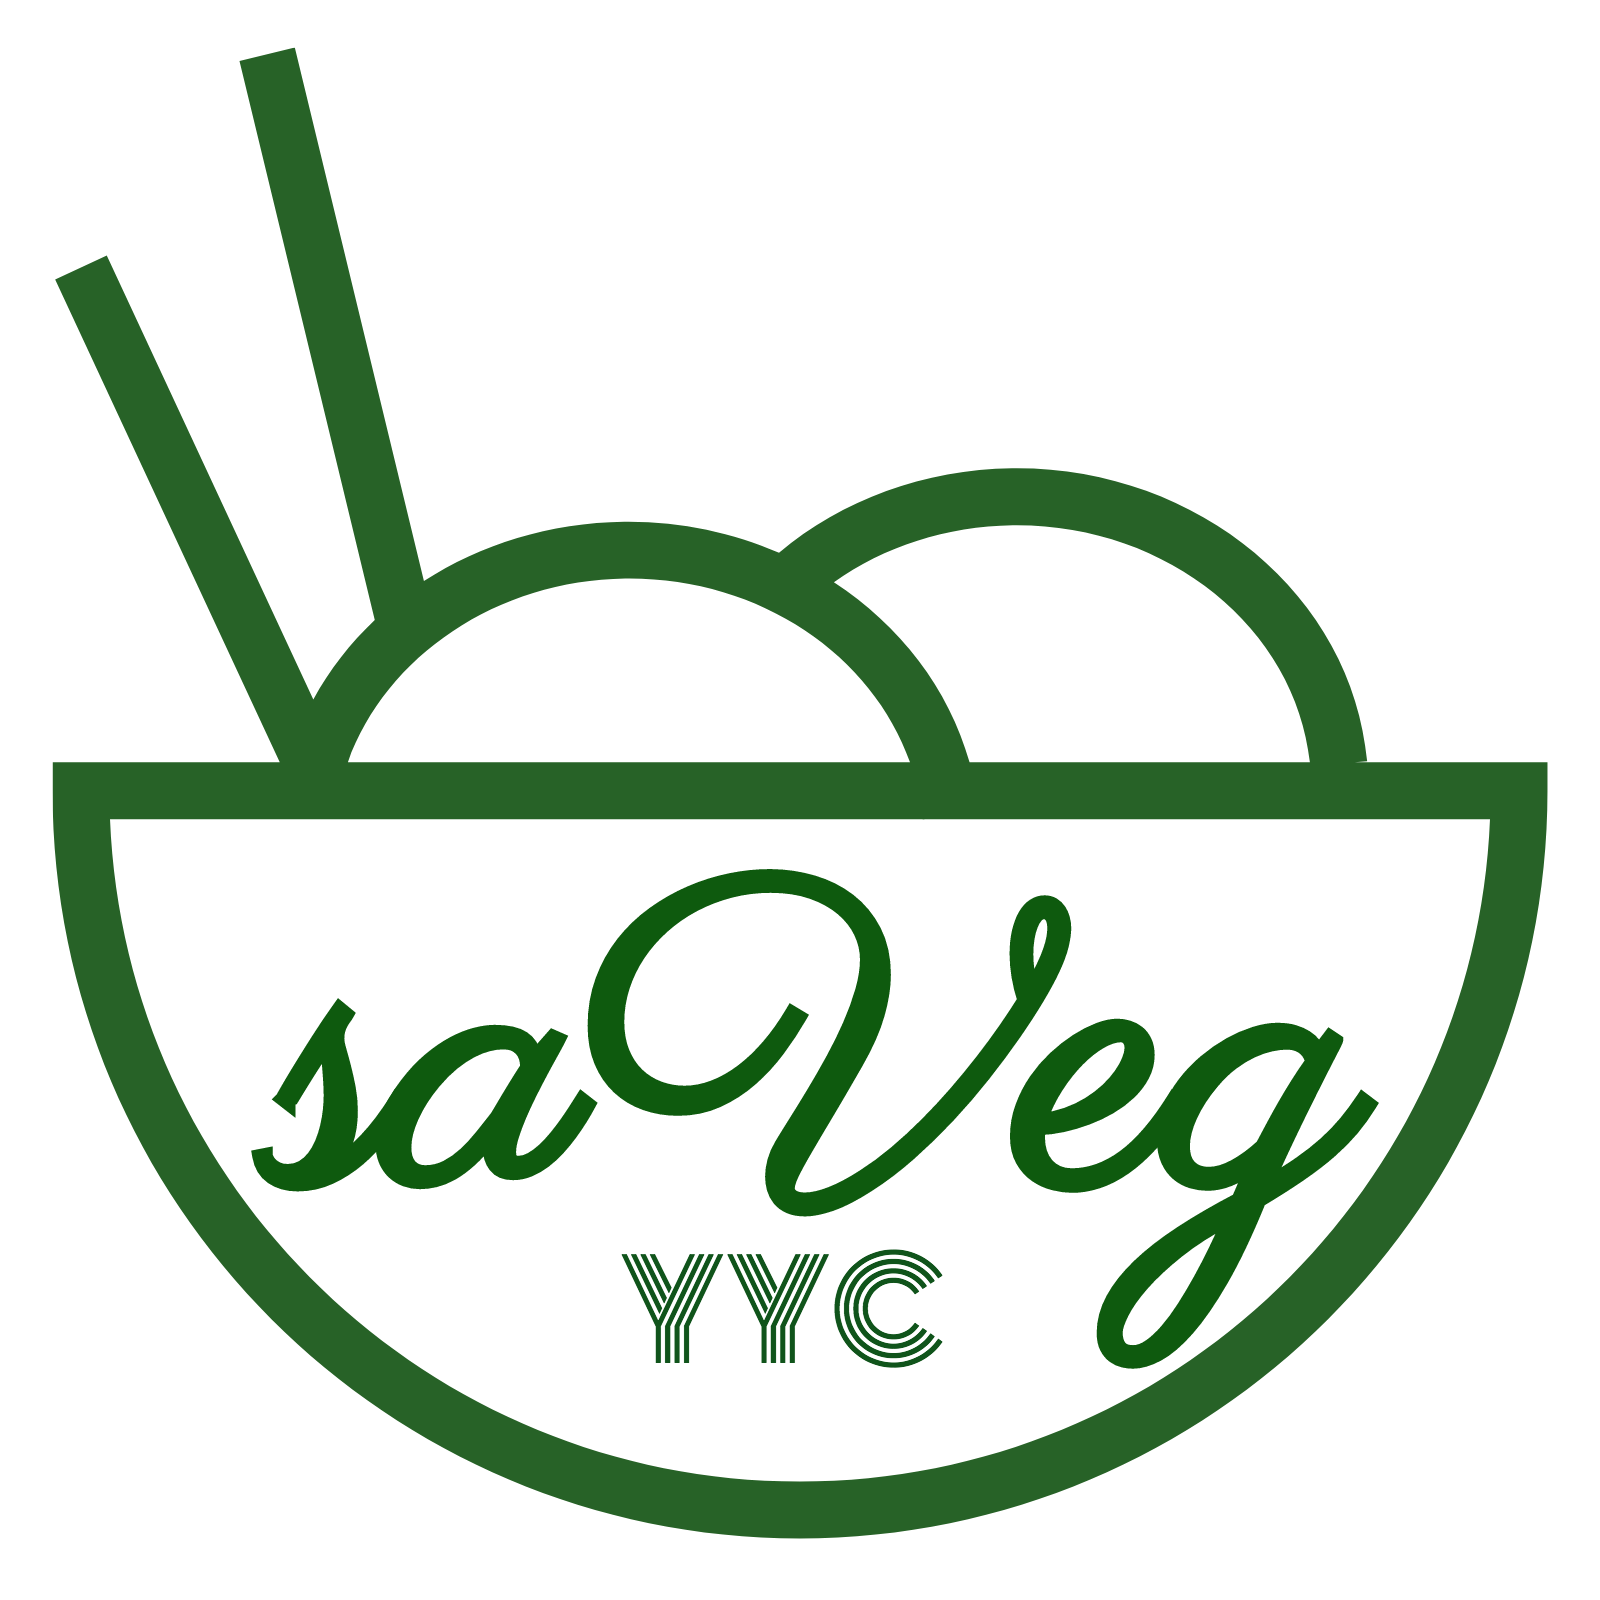 SaVegCafe.png